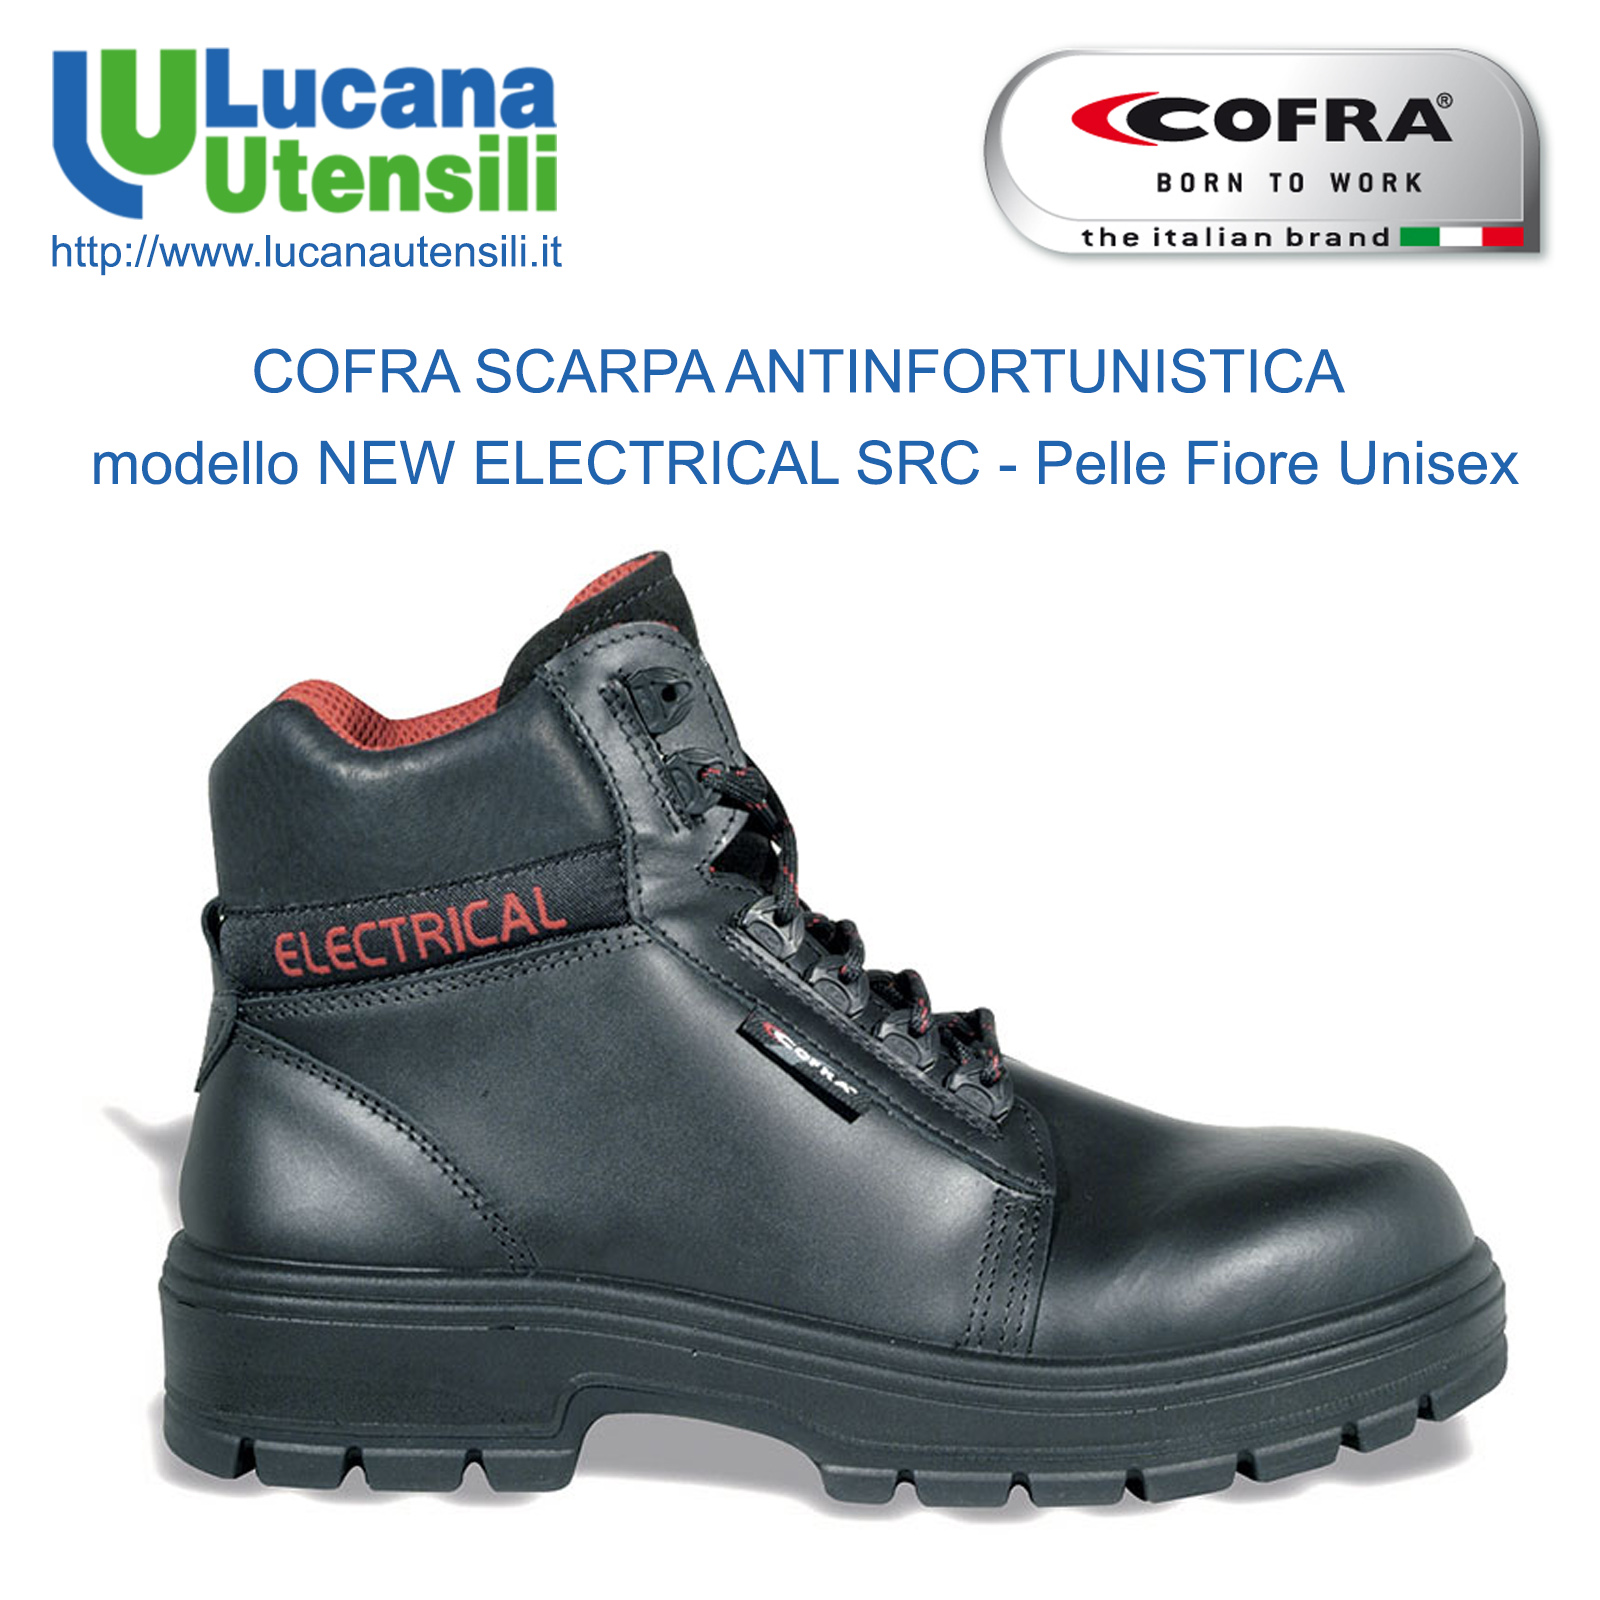 COFRA SCARPA ANTINFORTUNISTICA modello NEW ELECTRICAL SRC – Pelle ... c967fce1eec